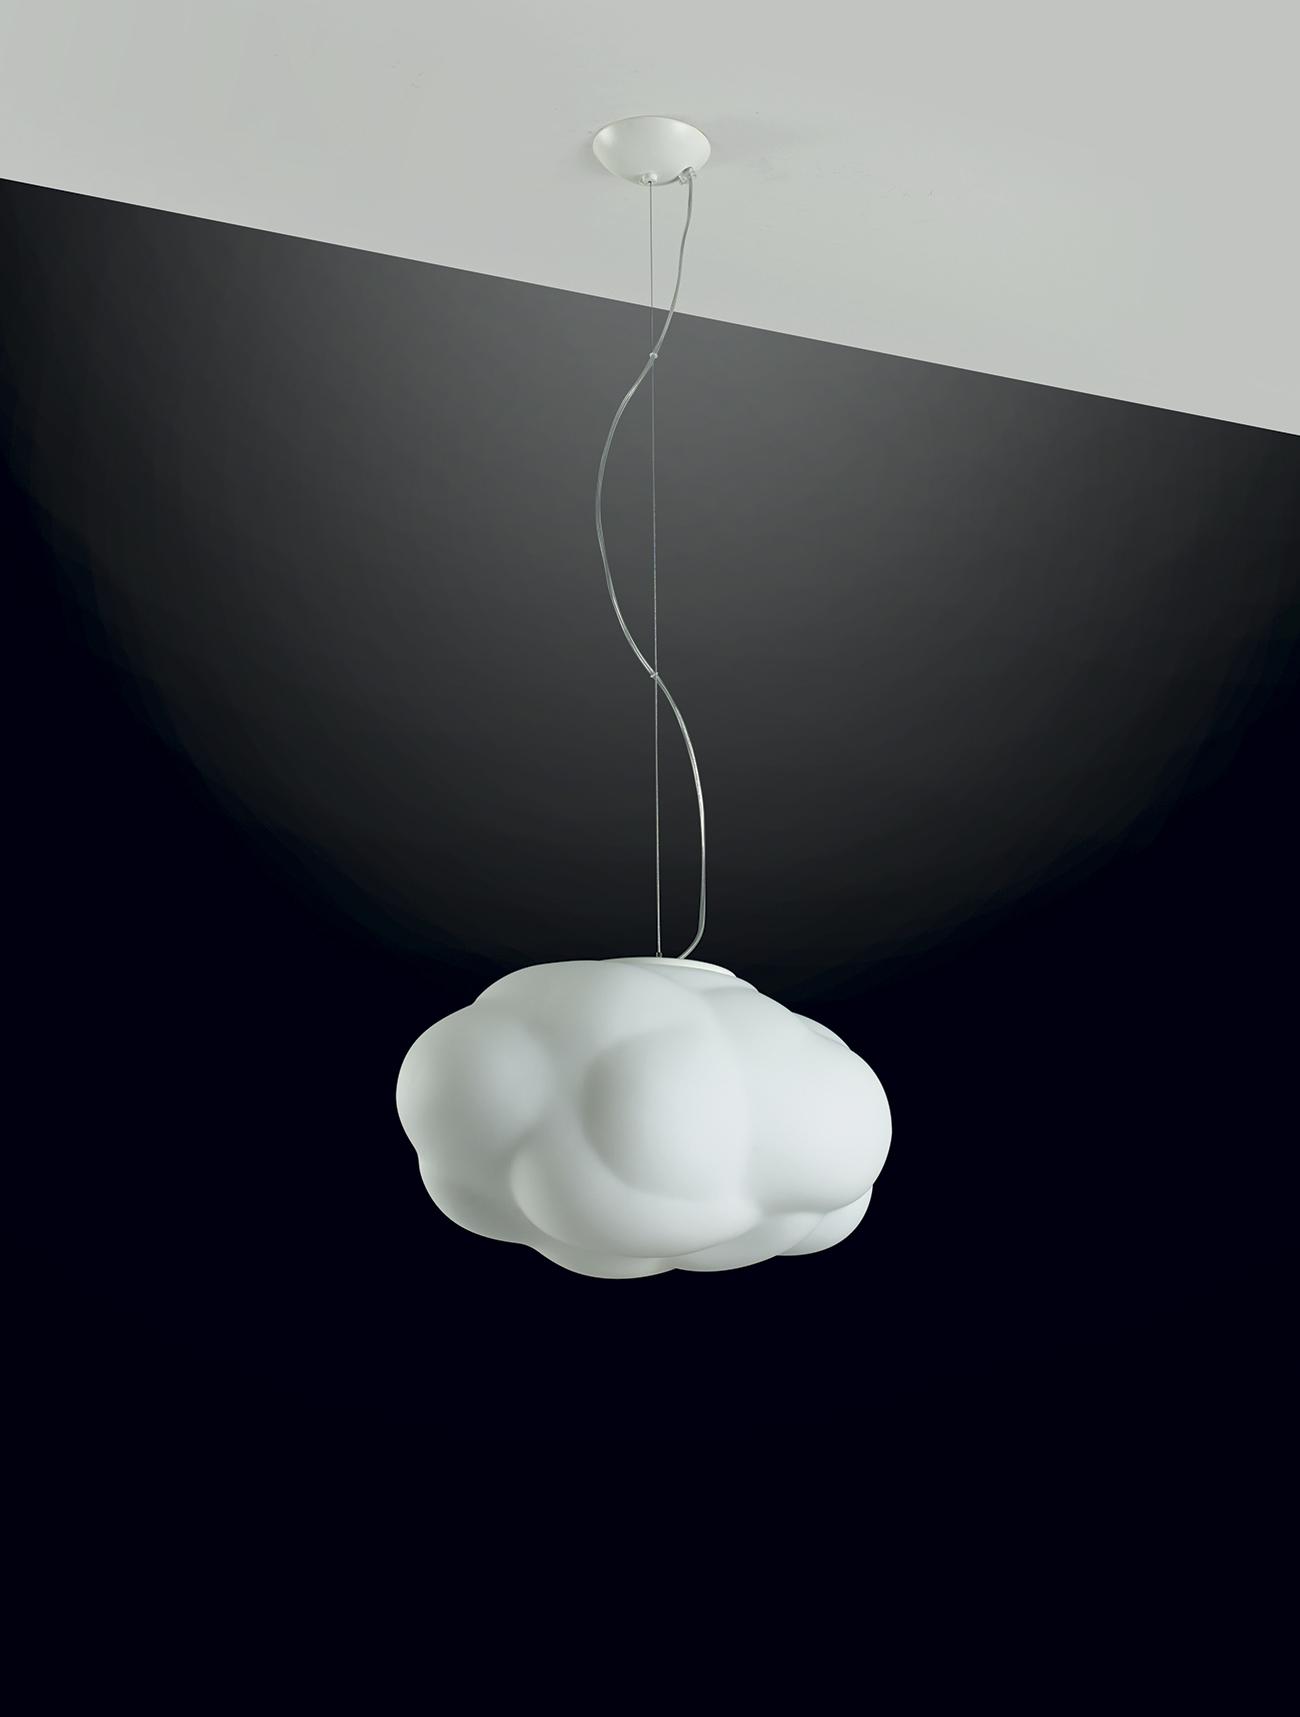 nuvoola-still-life